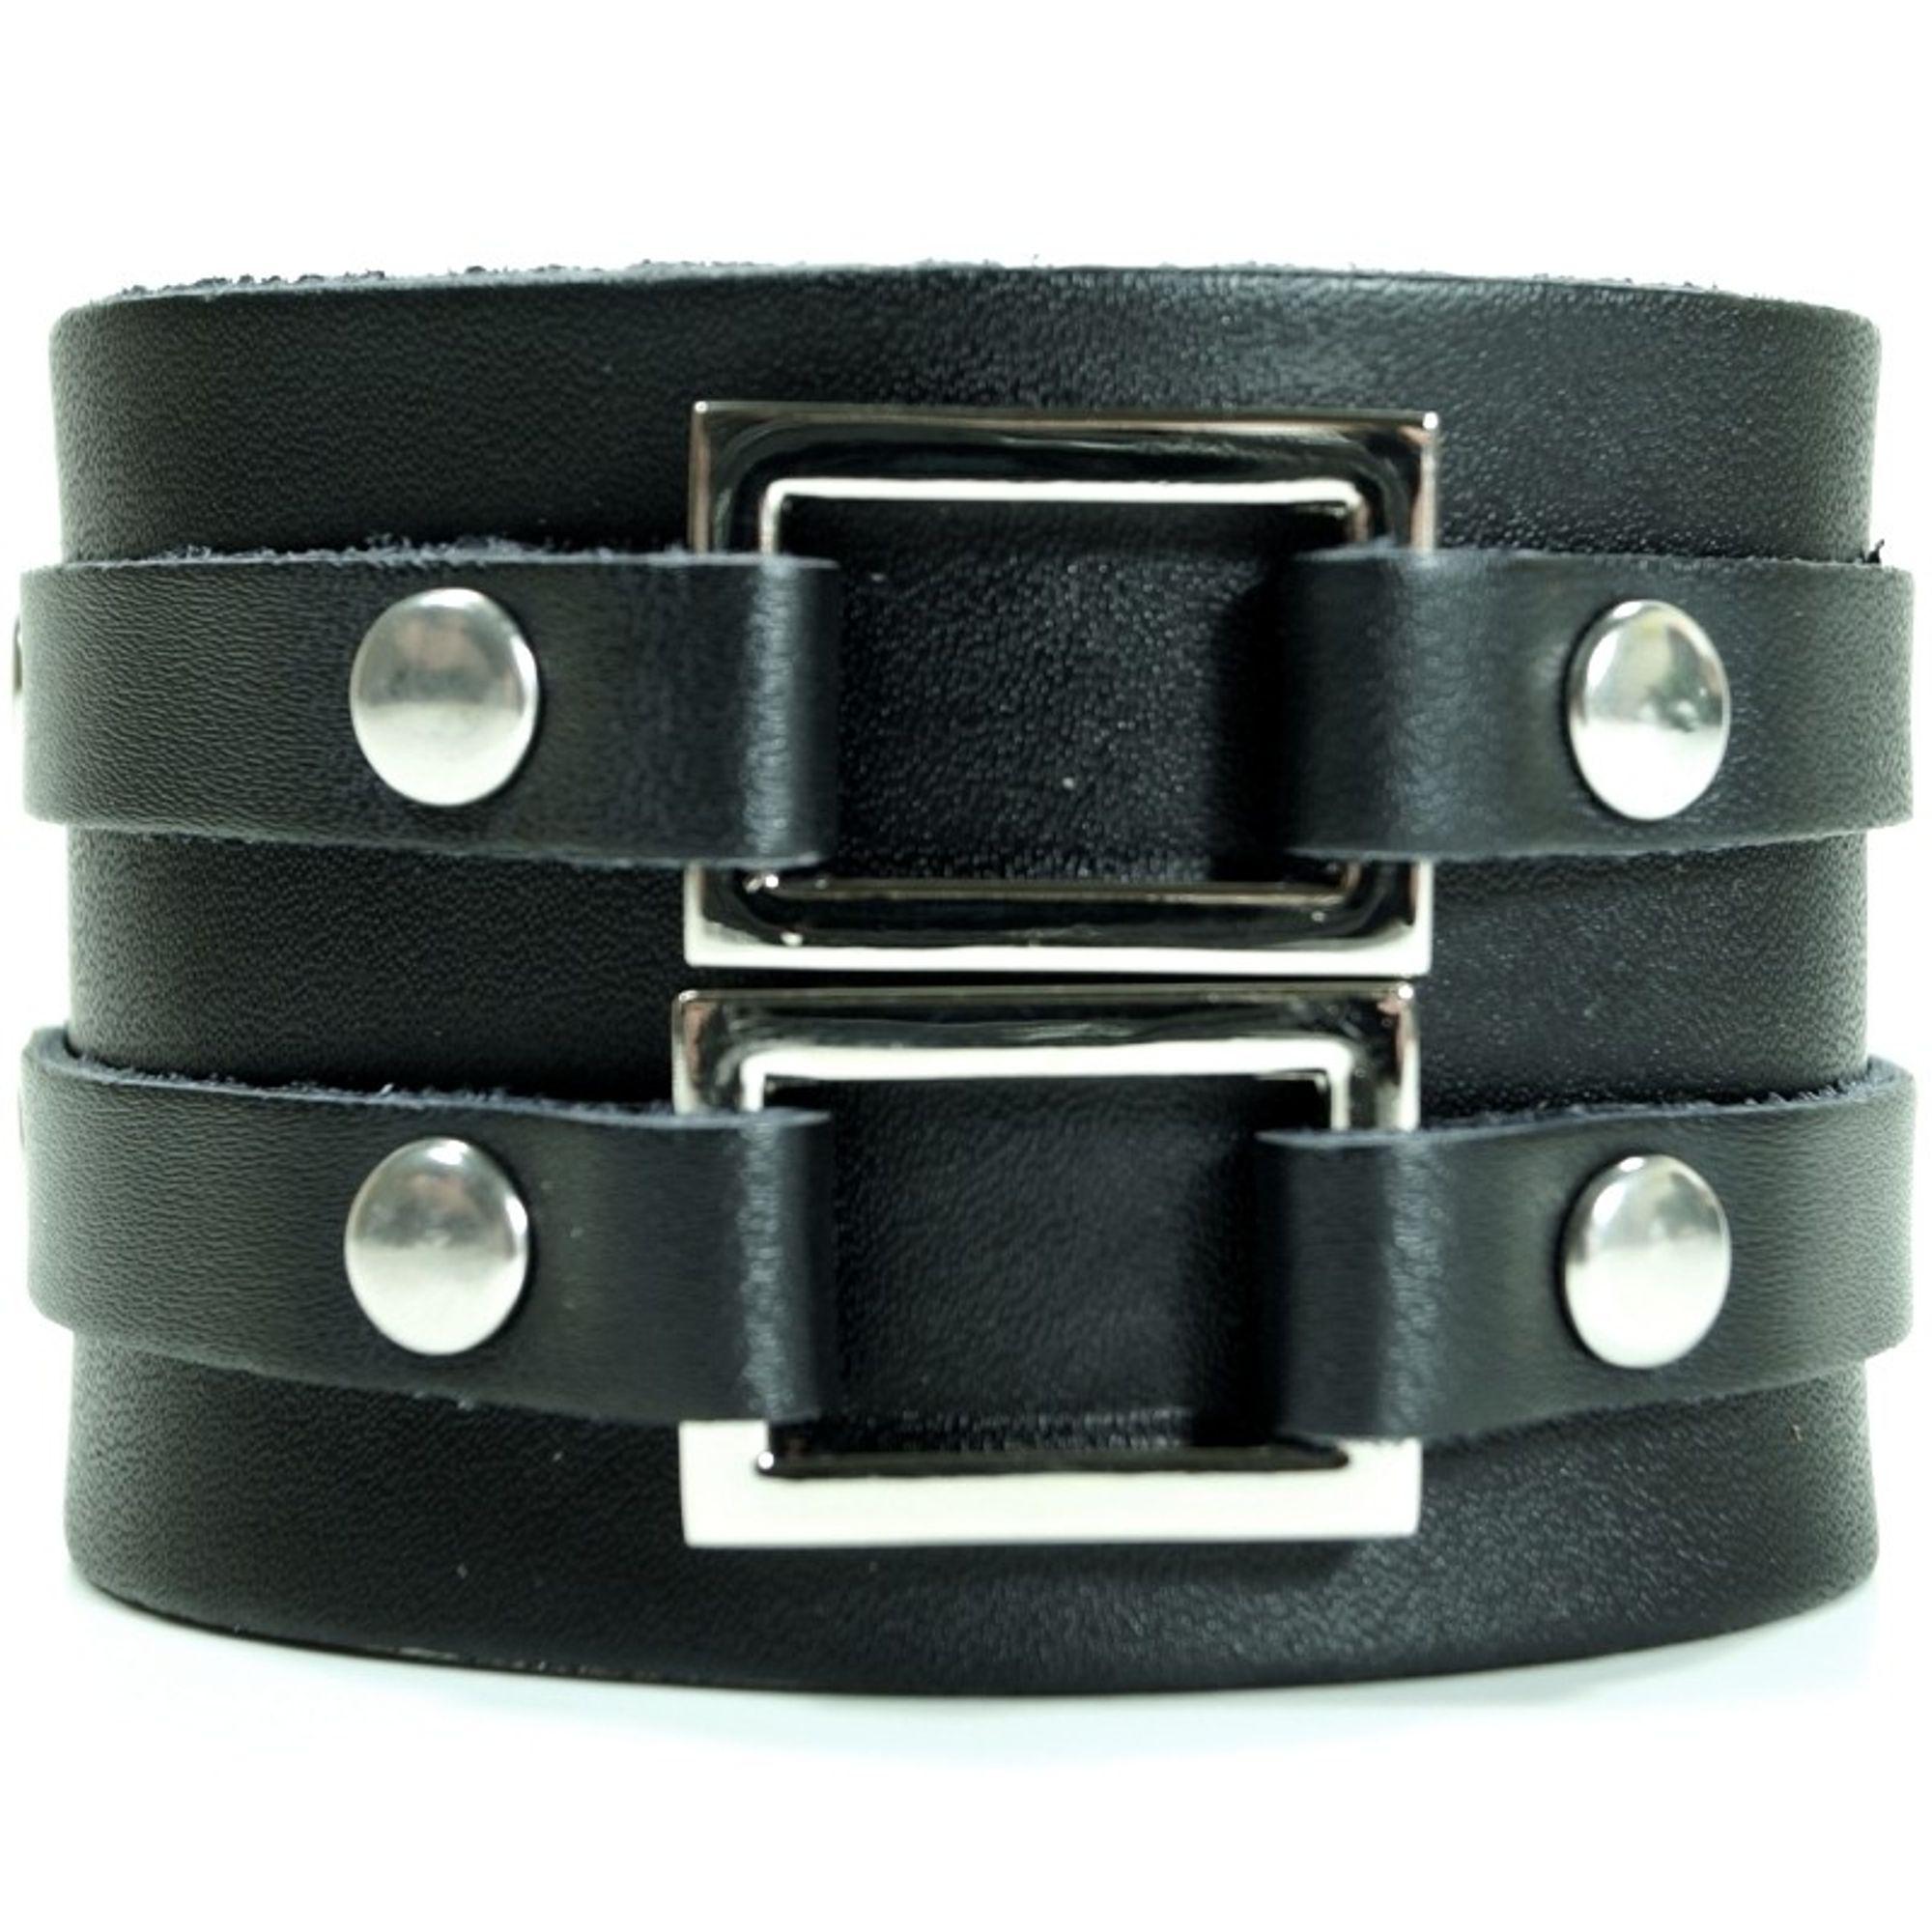 CJBB1912 Herren Armband Leder schwarz 21,5 cm